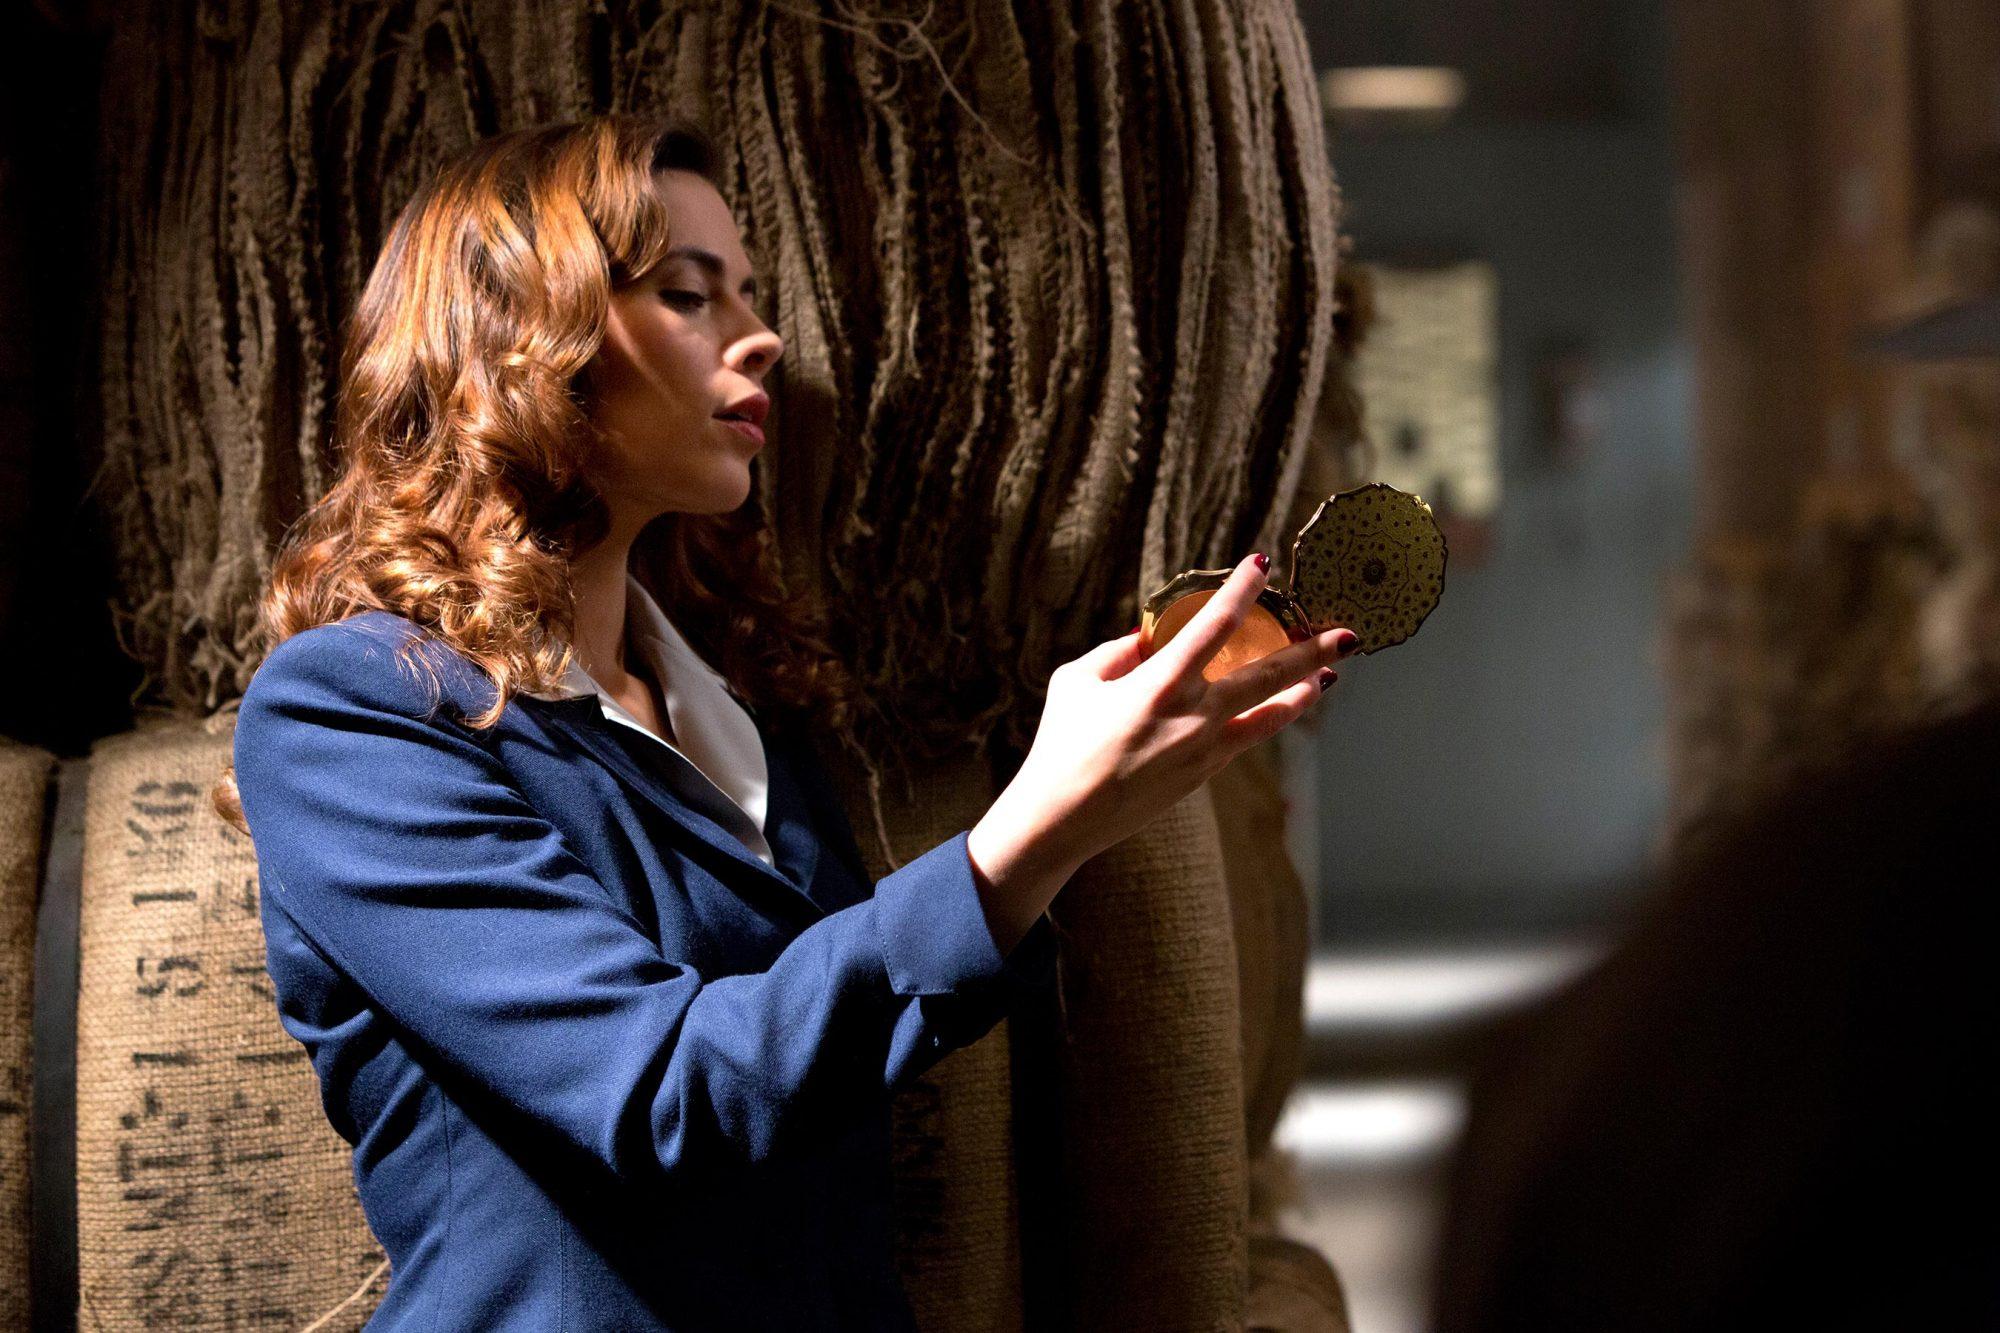 Marvel One-Shot: Agent CarterHayley Atwellon Iron Man 3 DVD